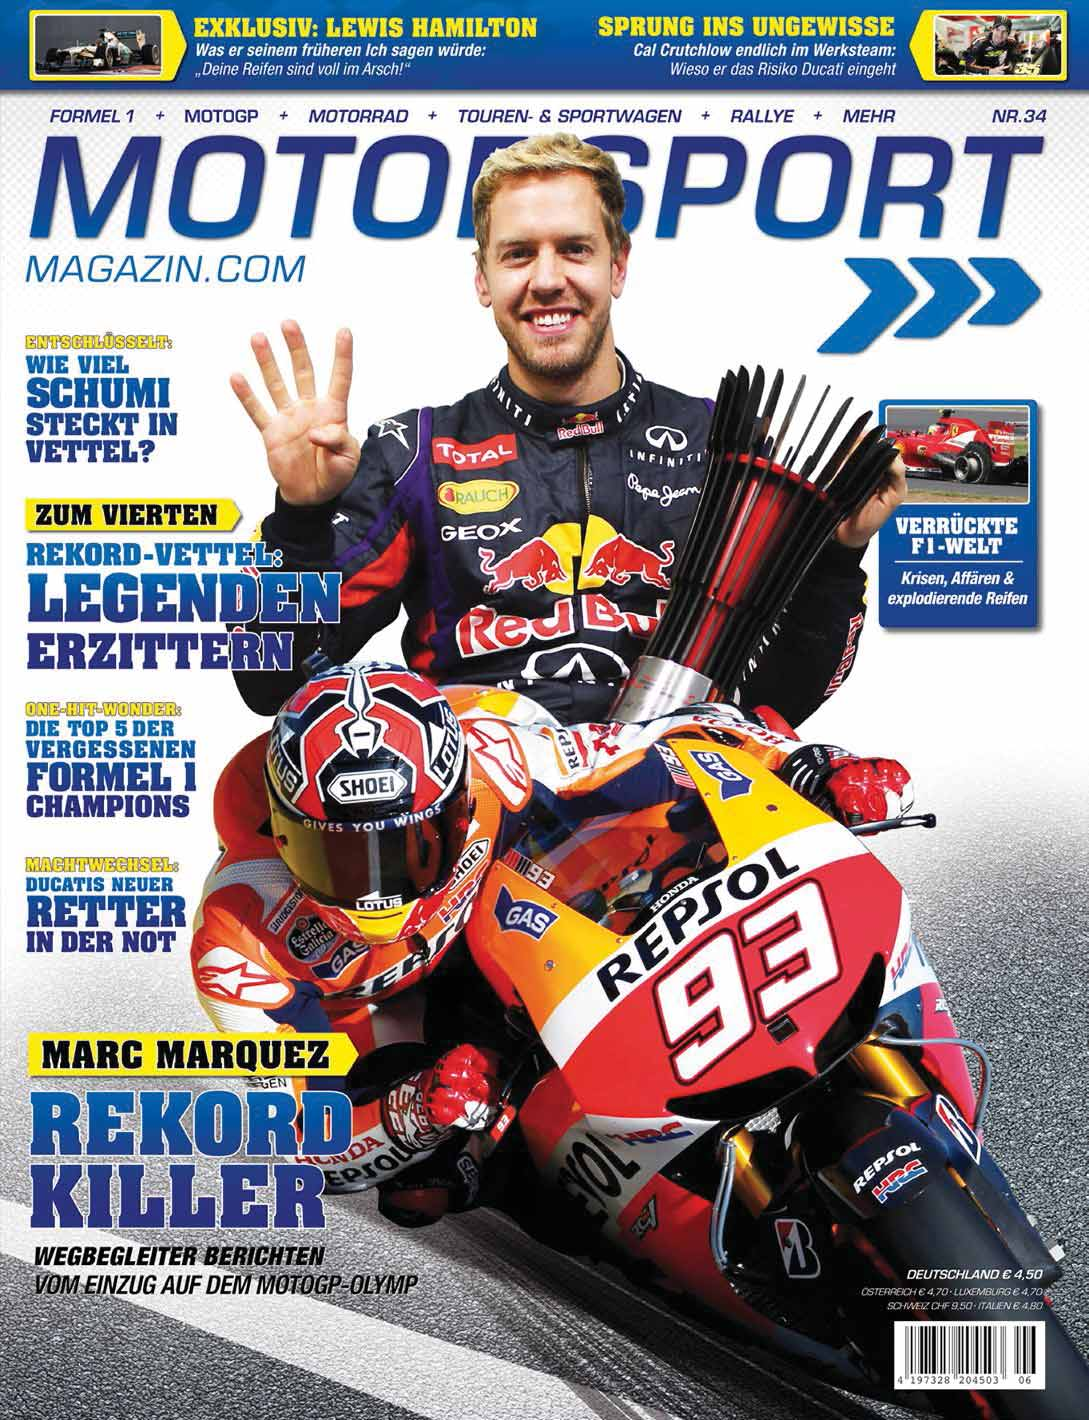 Download Motorsport Magazin No 34 Softarchive